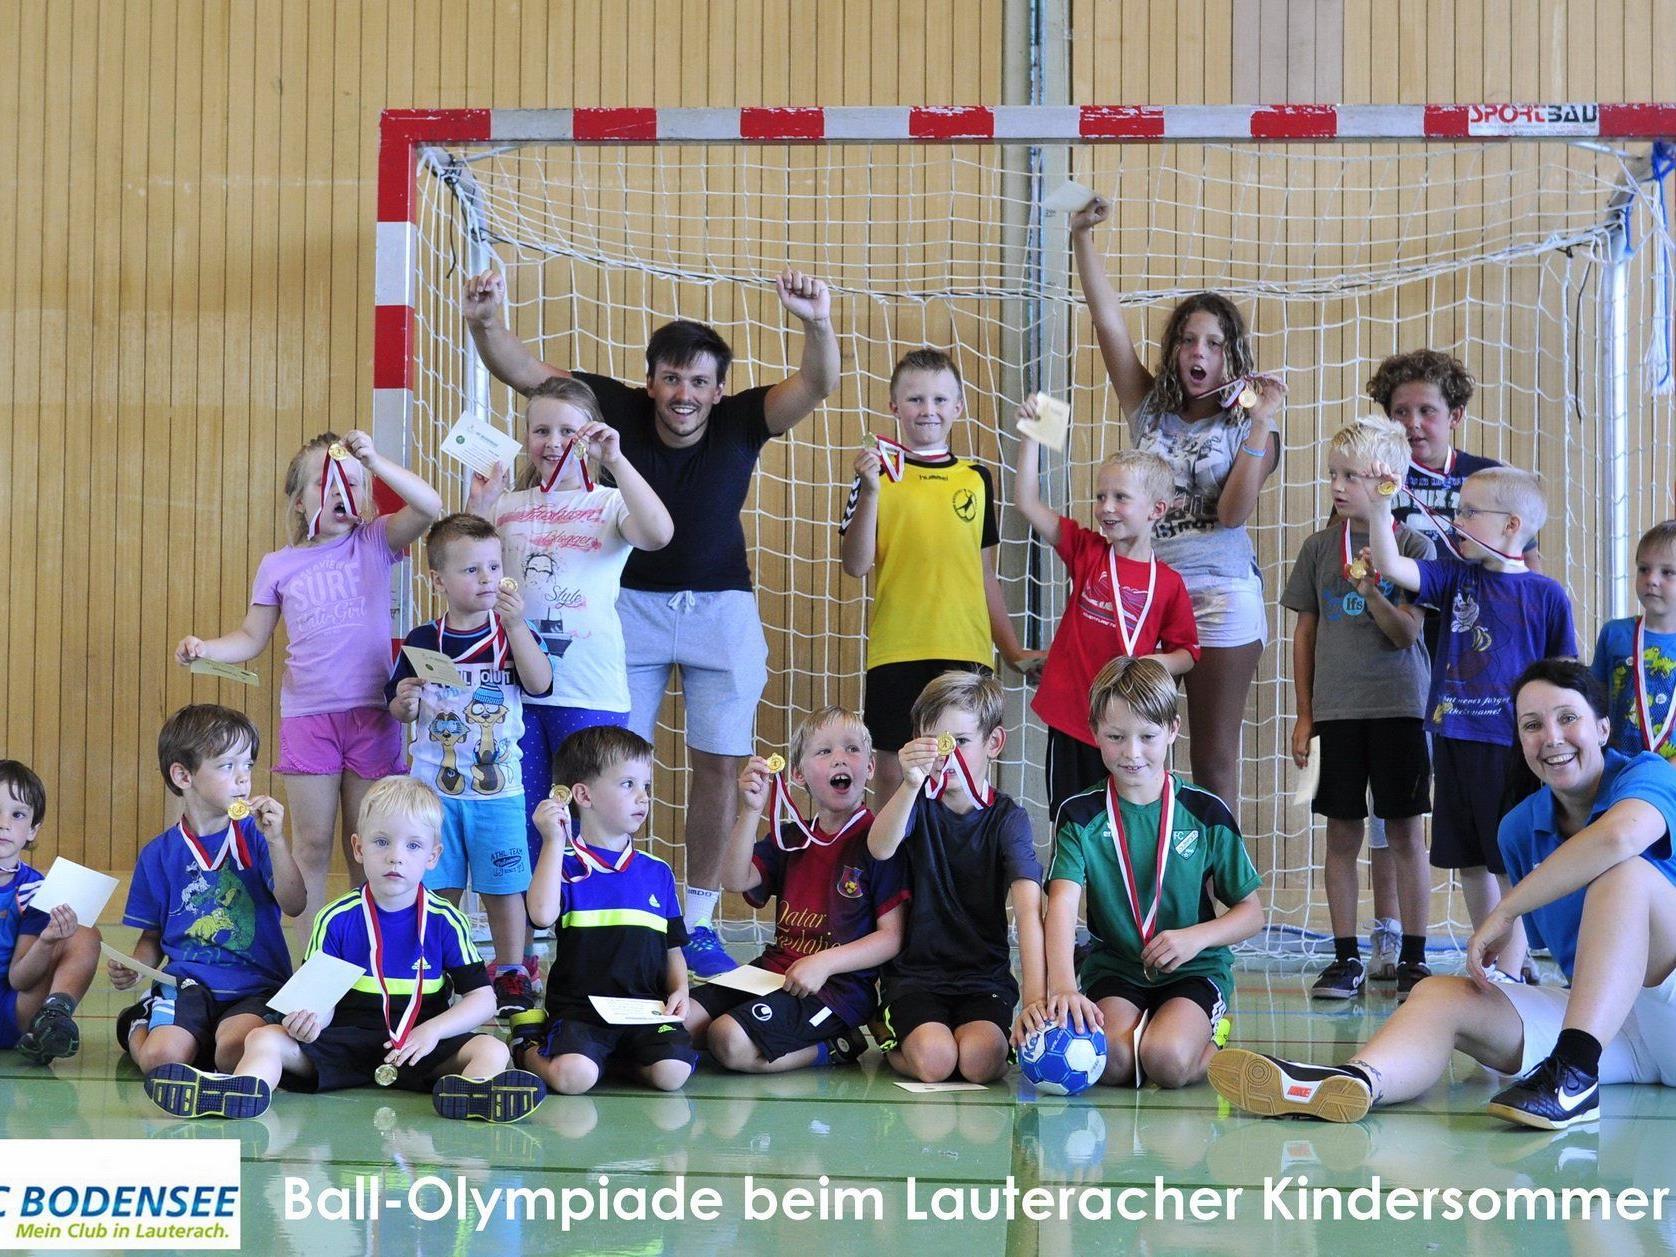 Ball-Olympiade 2015